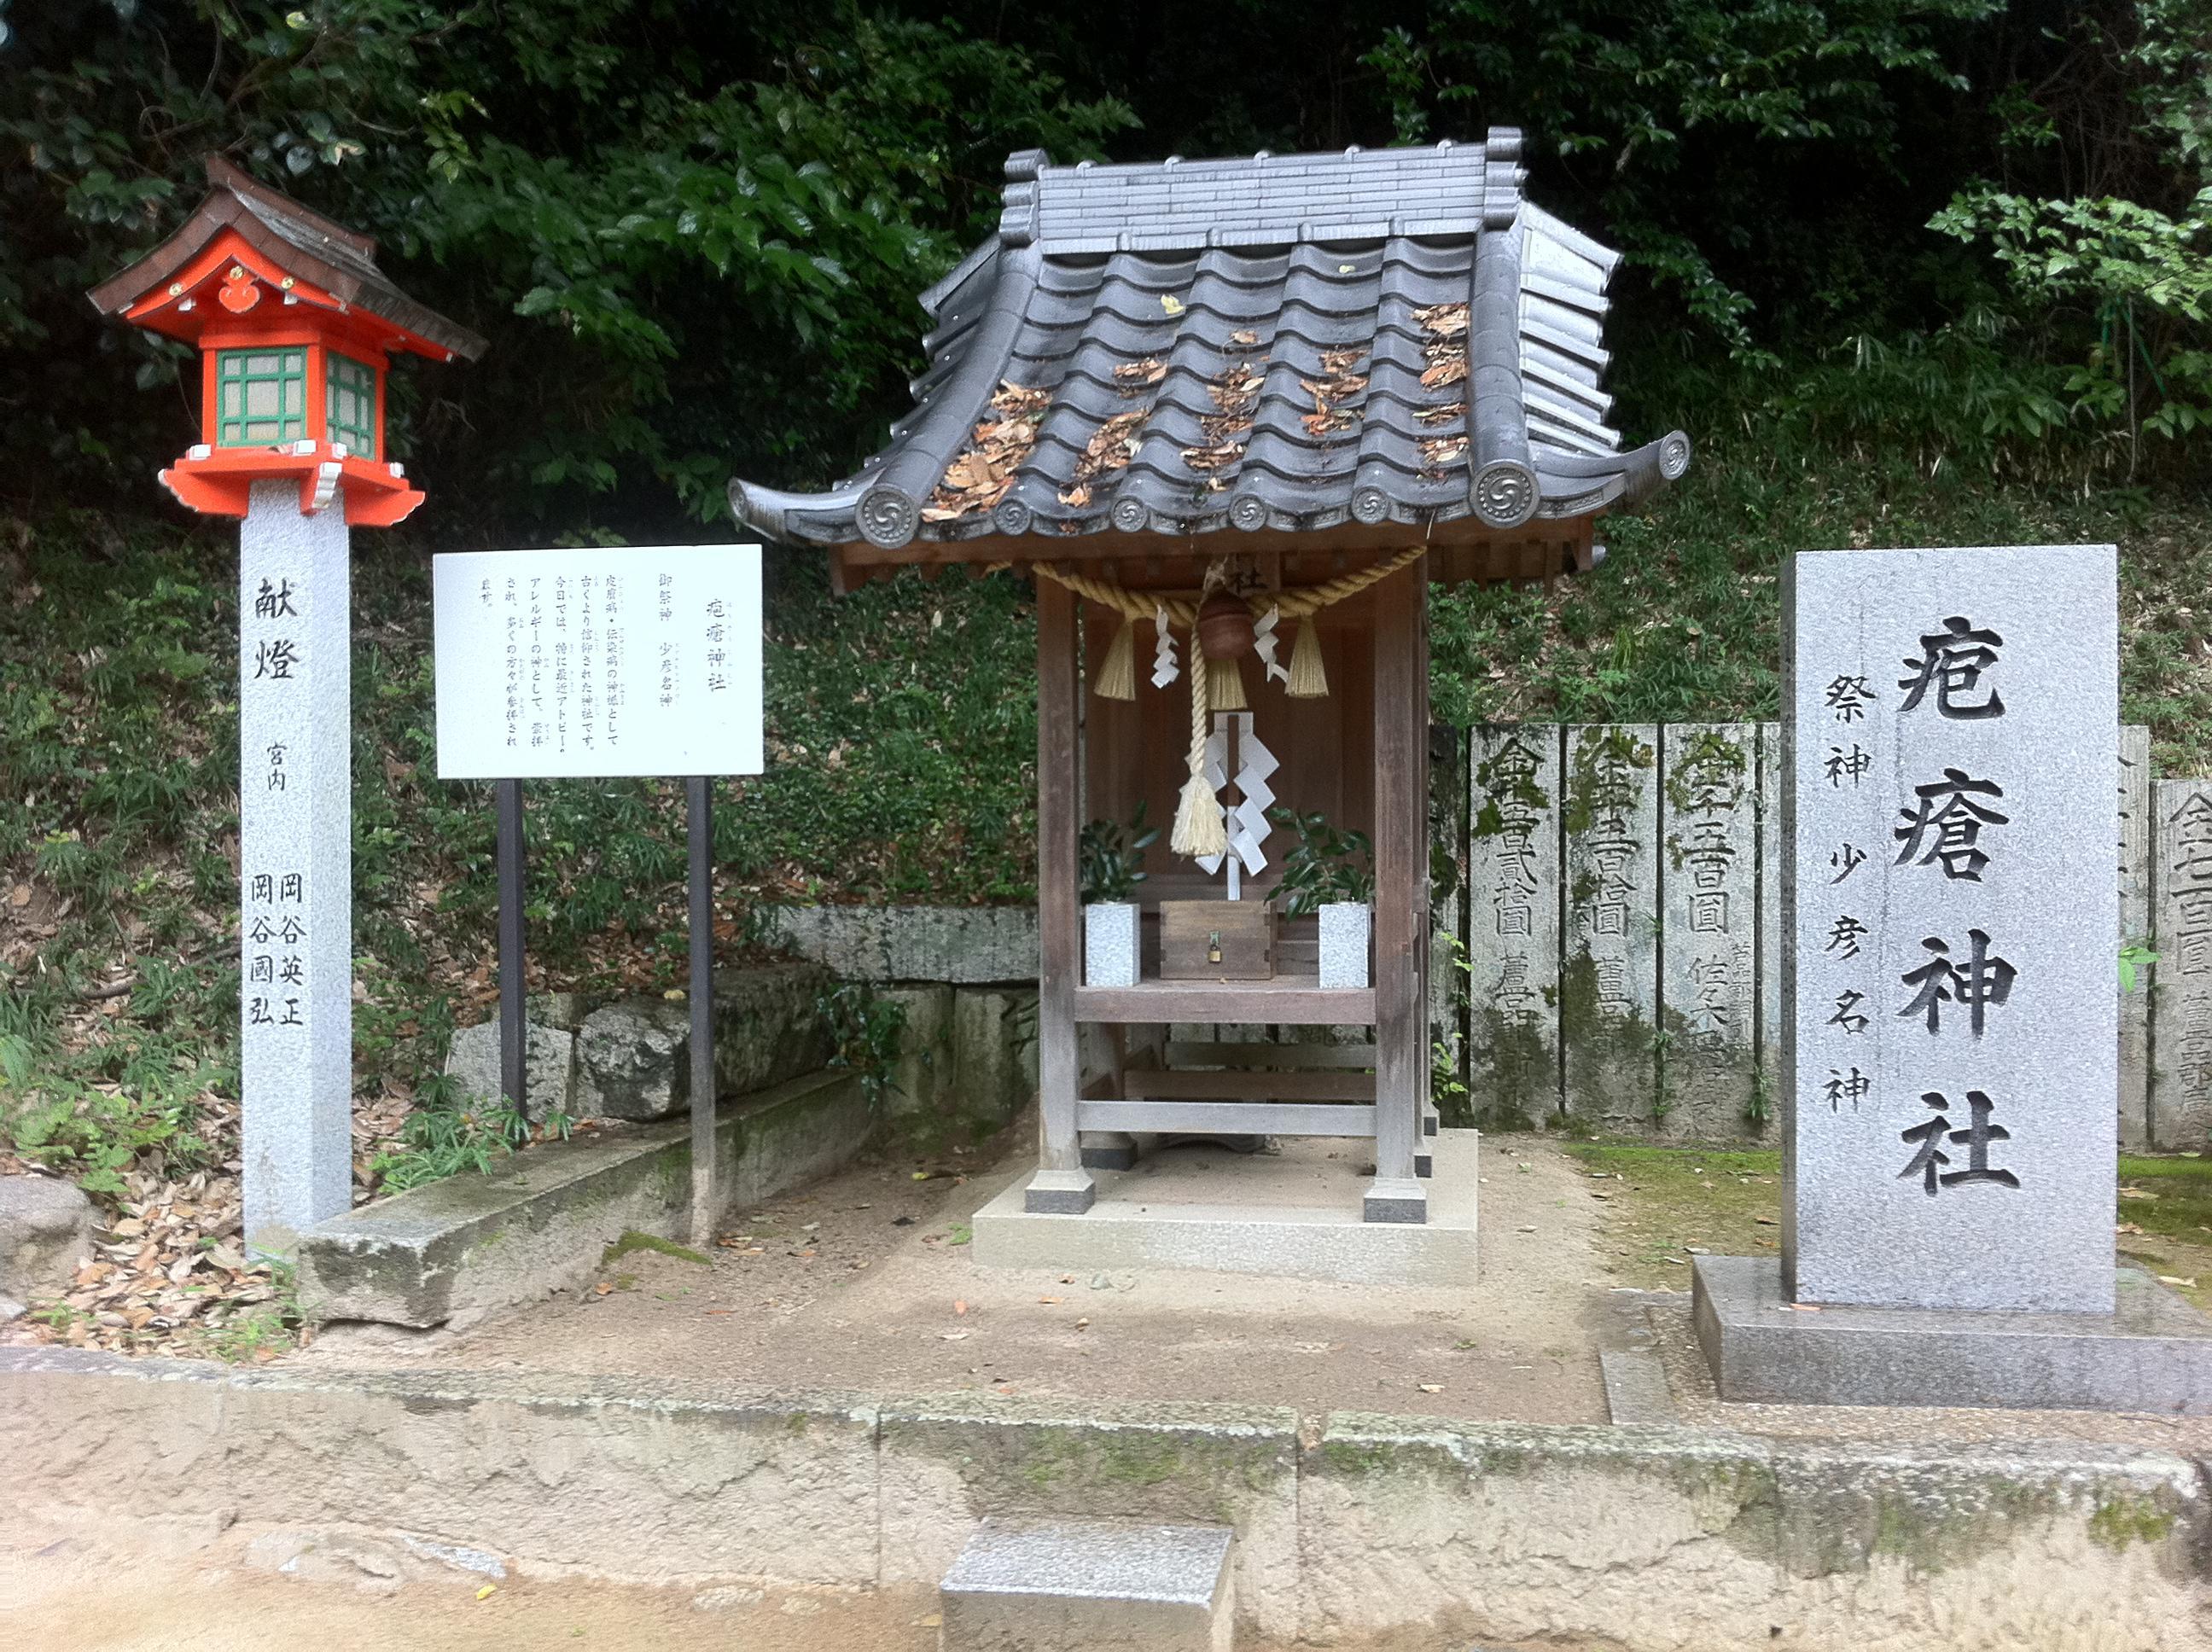 吉備津神社の本殿